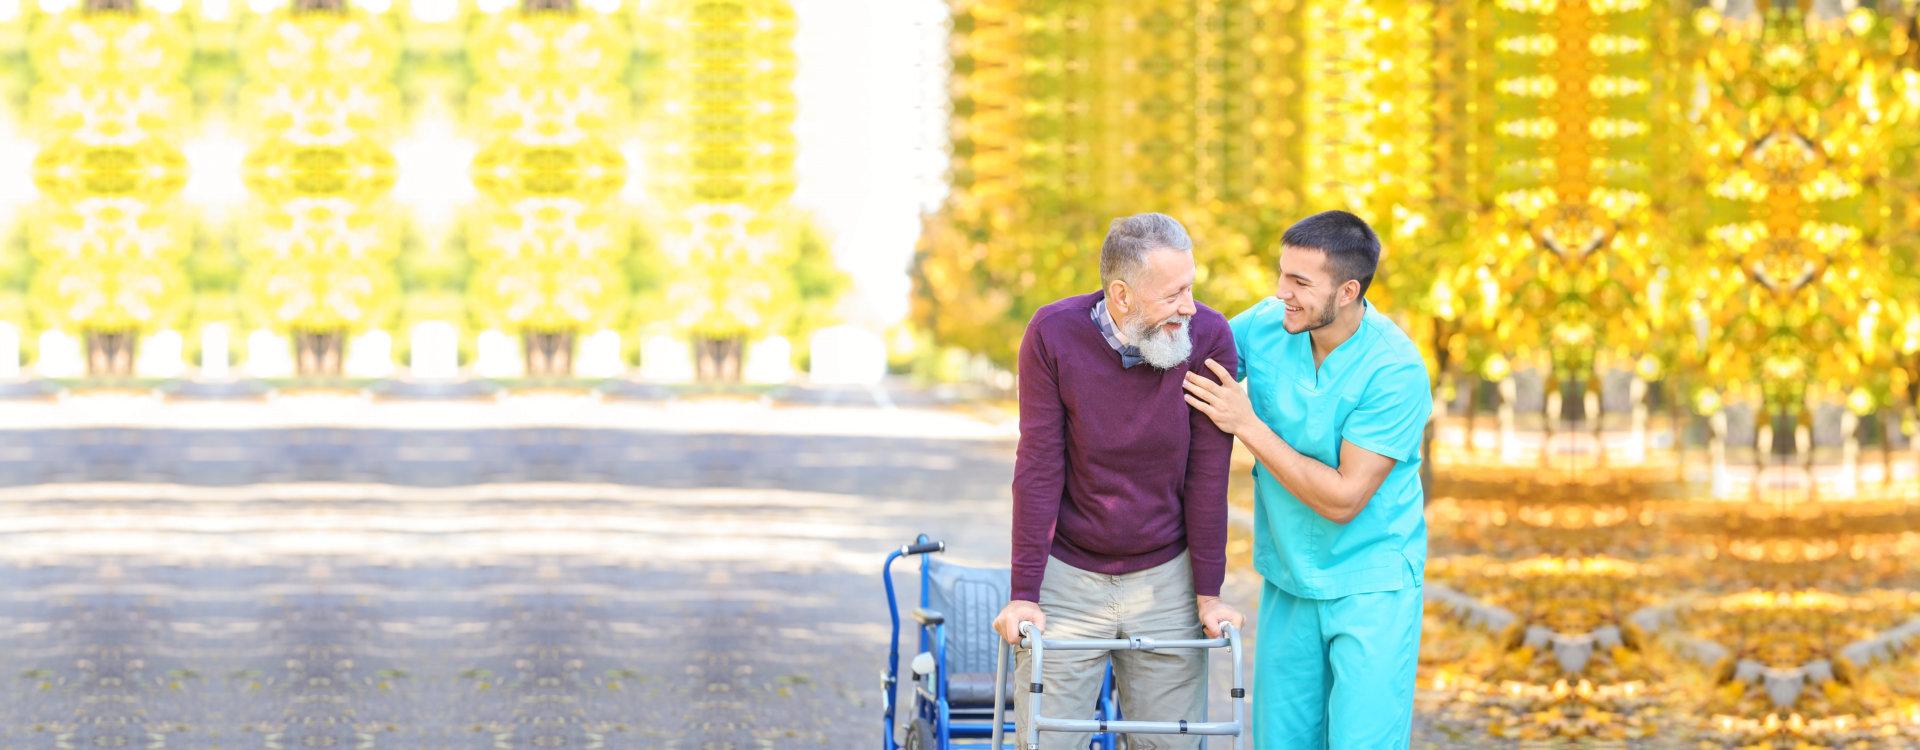 man assisting elder man in walking